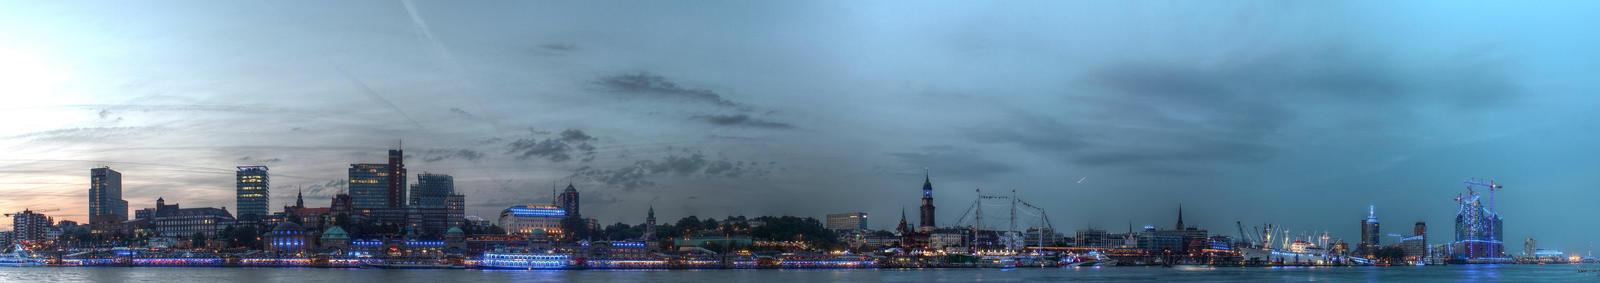 Blue Habor - Hamburg Elbbruecken by TiKy2010